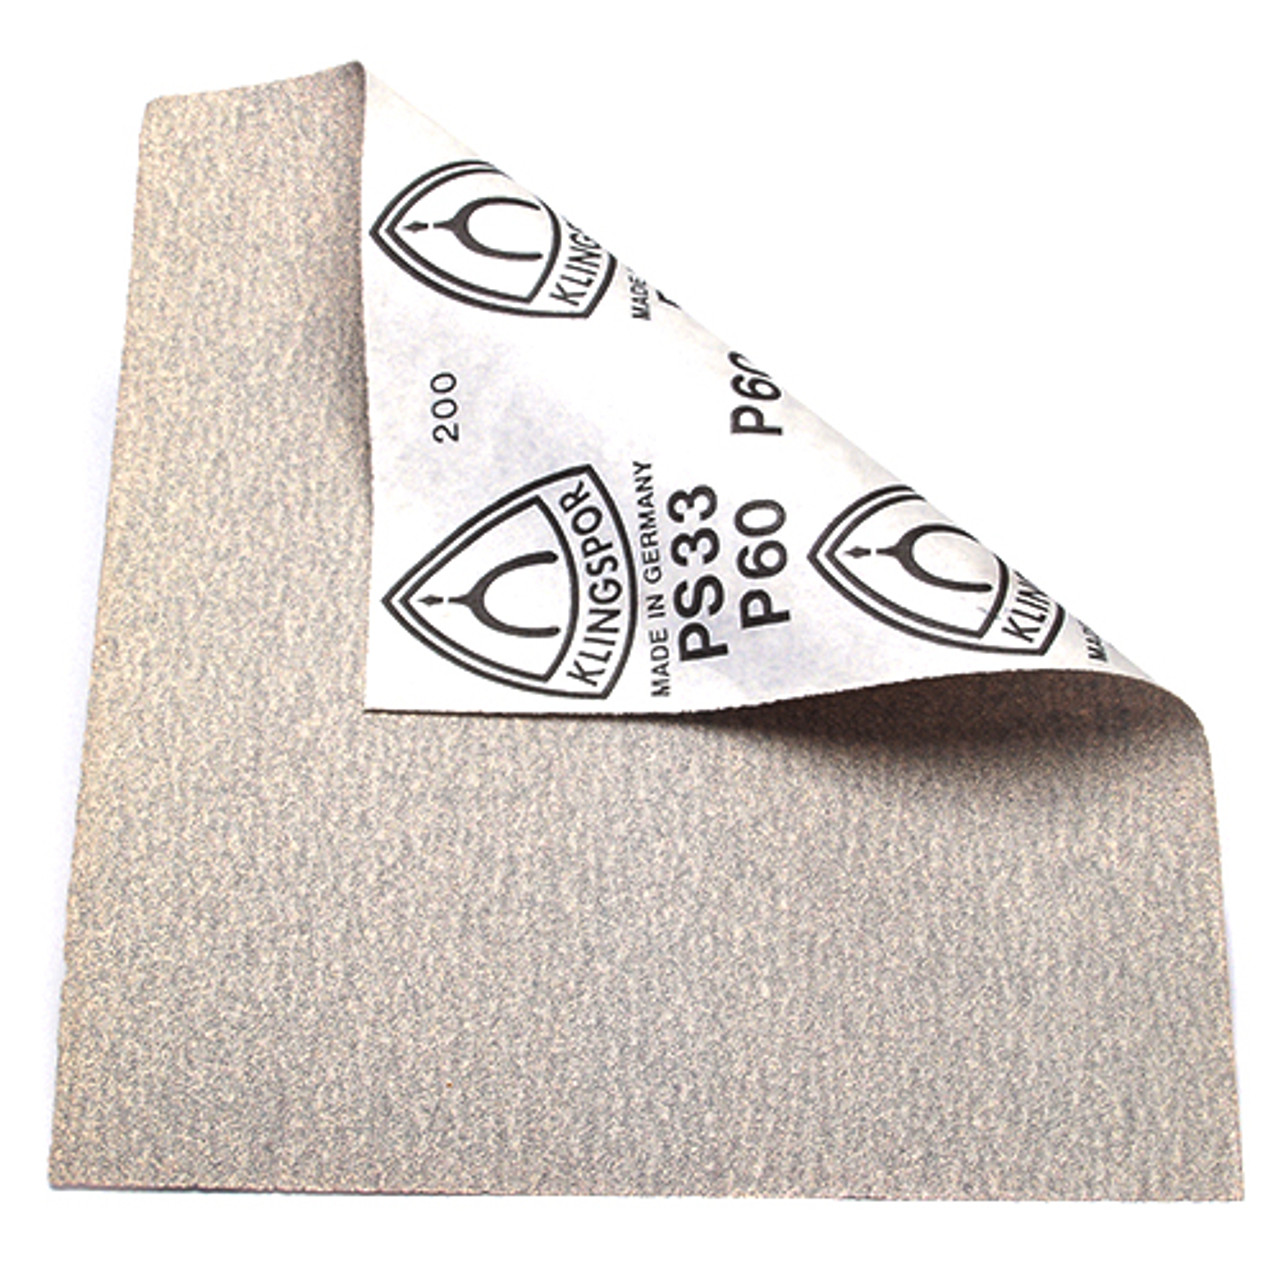 "Klingspor Abrasives 120 Grit, Stearate Aluminum Oxide, Paper Backed, 9""x 11"" Sheets, 50pk"